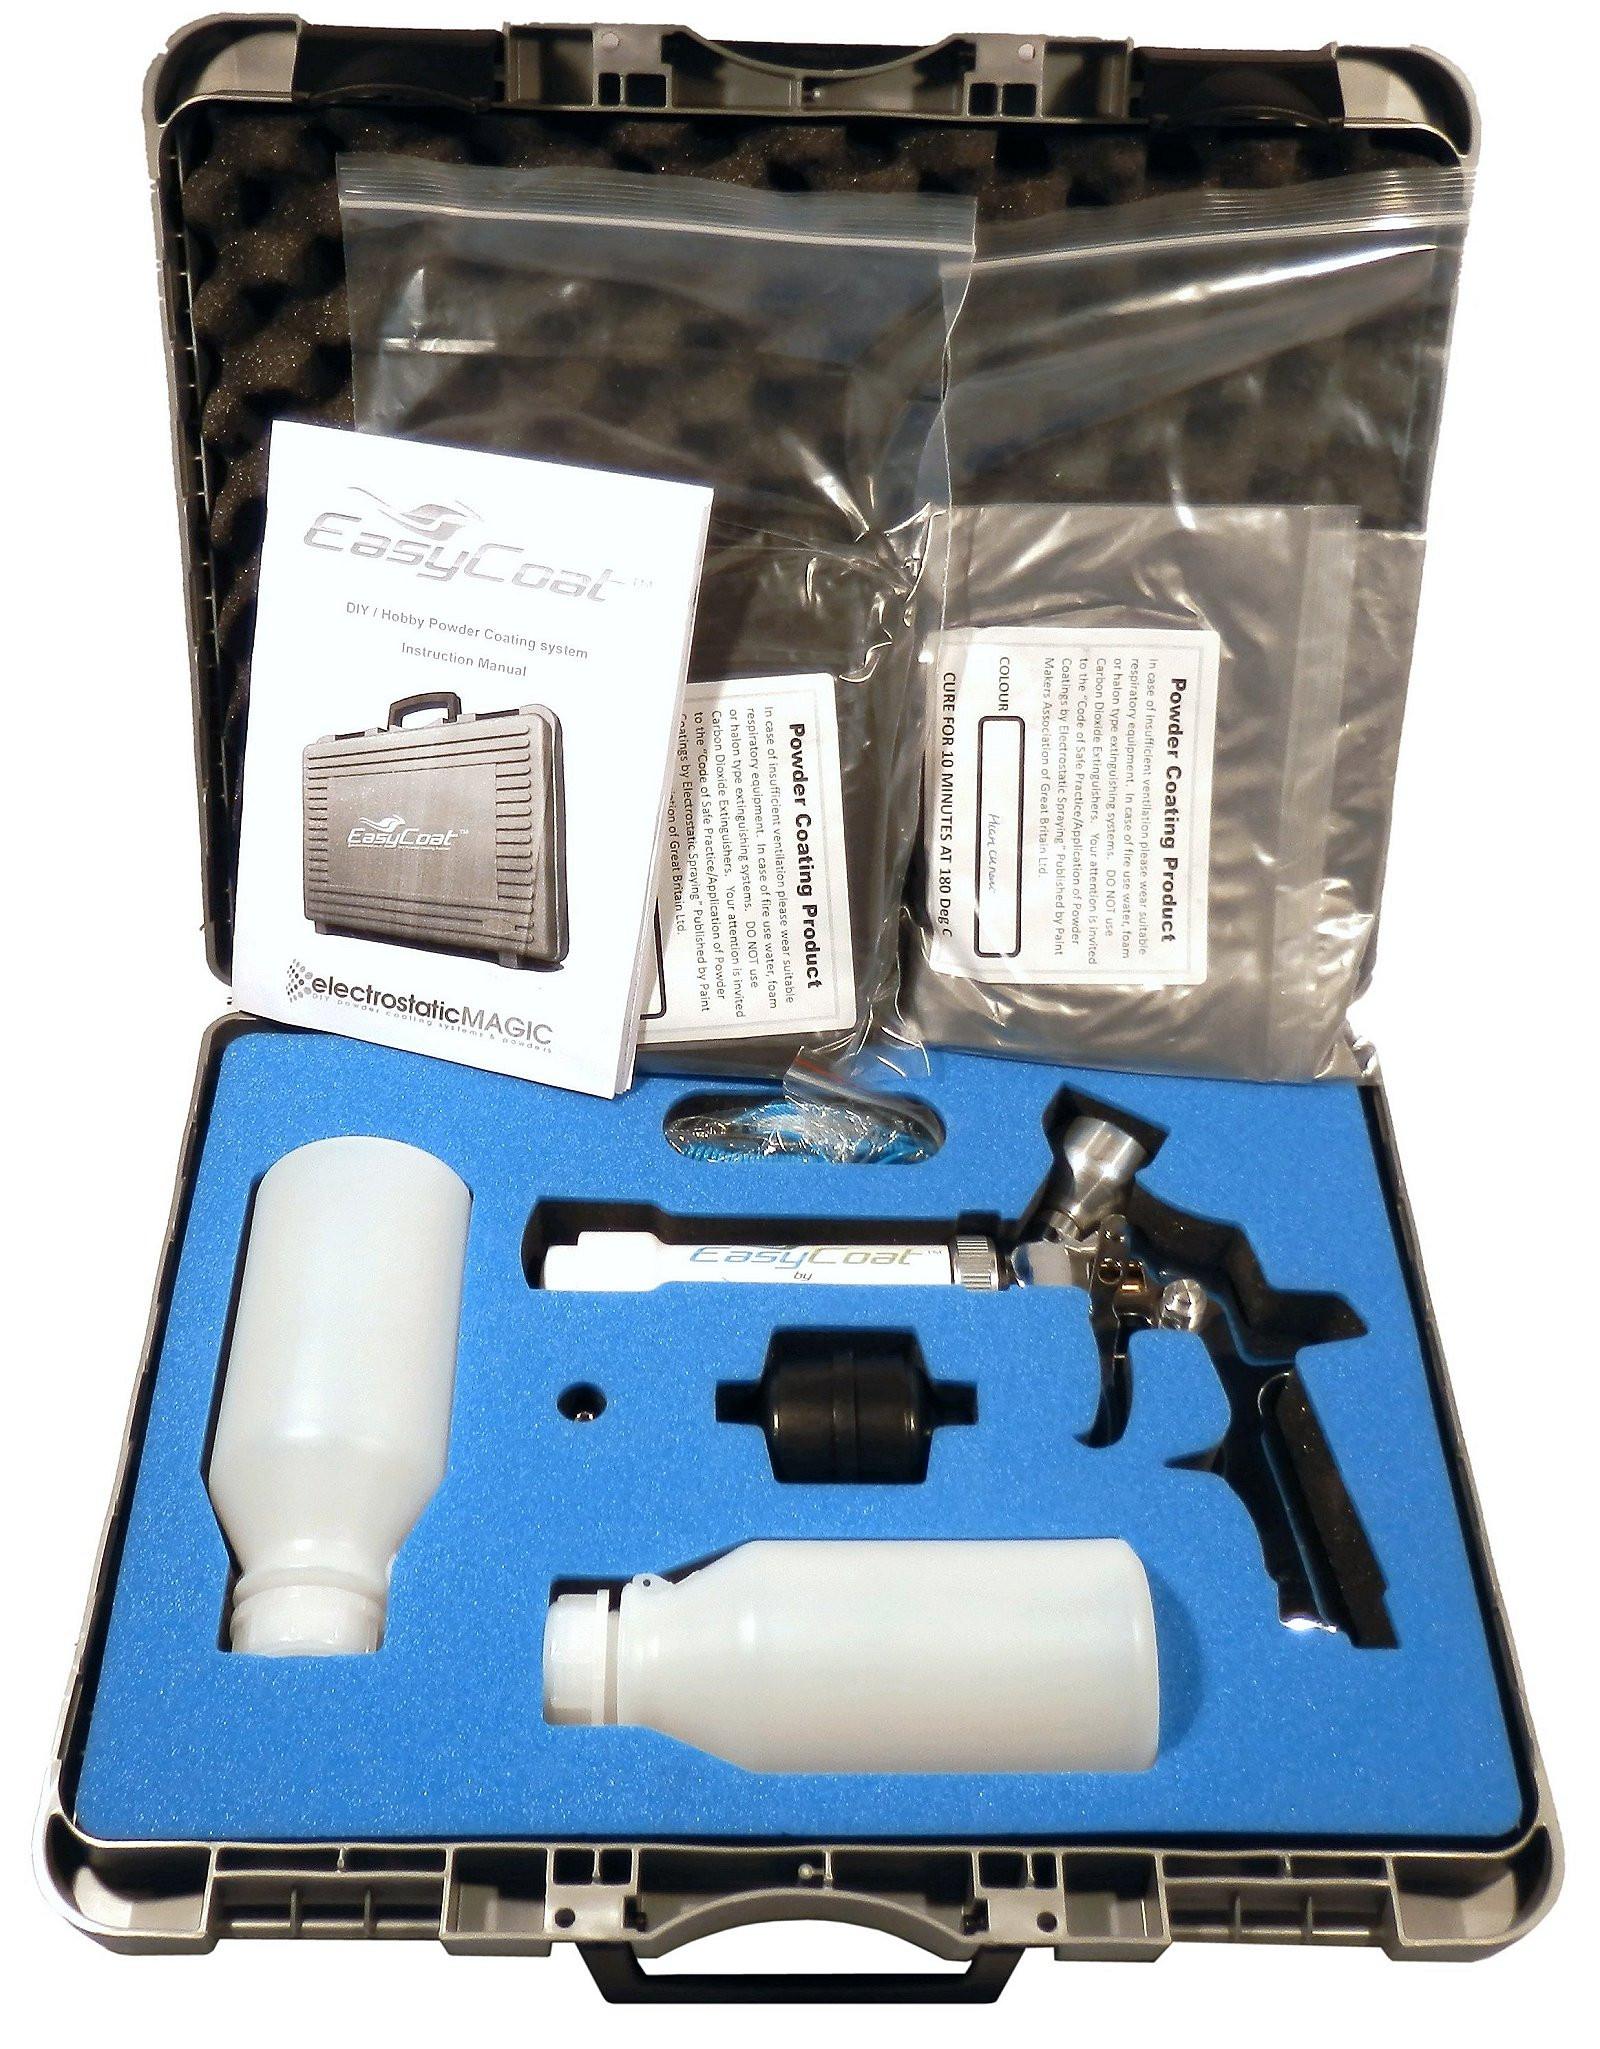 Best ideas about DIY Powder Coating Kits . Save or Pin EasyCoat ElectroStaticMAGIC DIY Hobby Plastic Powder Now.